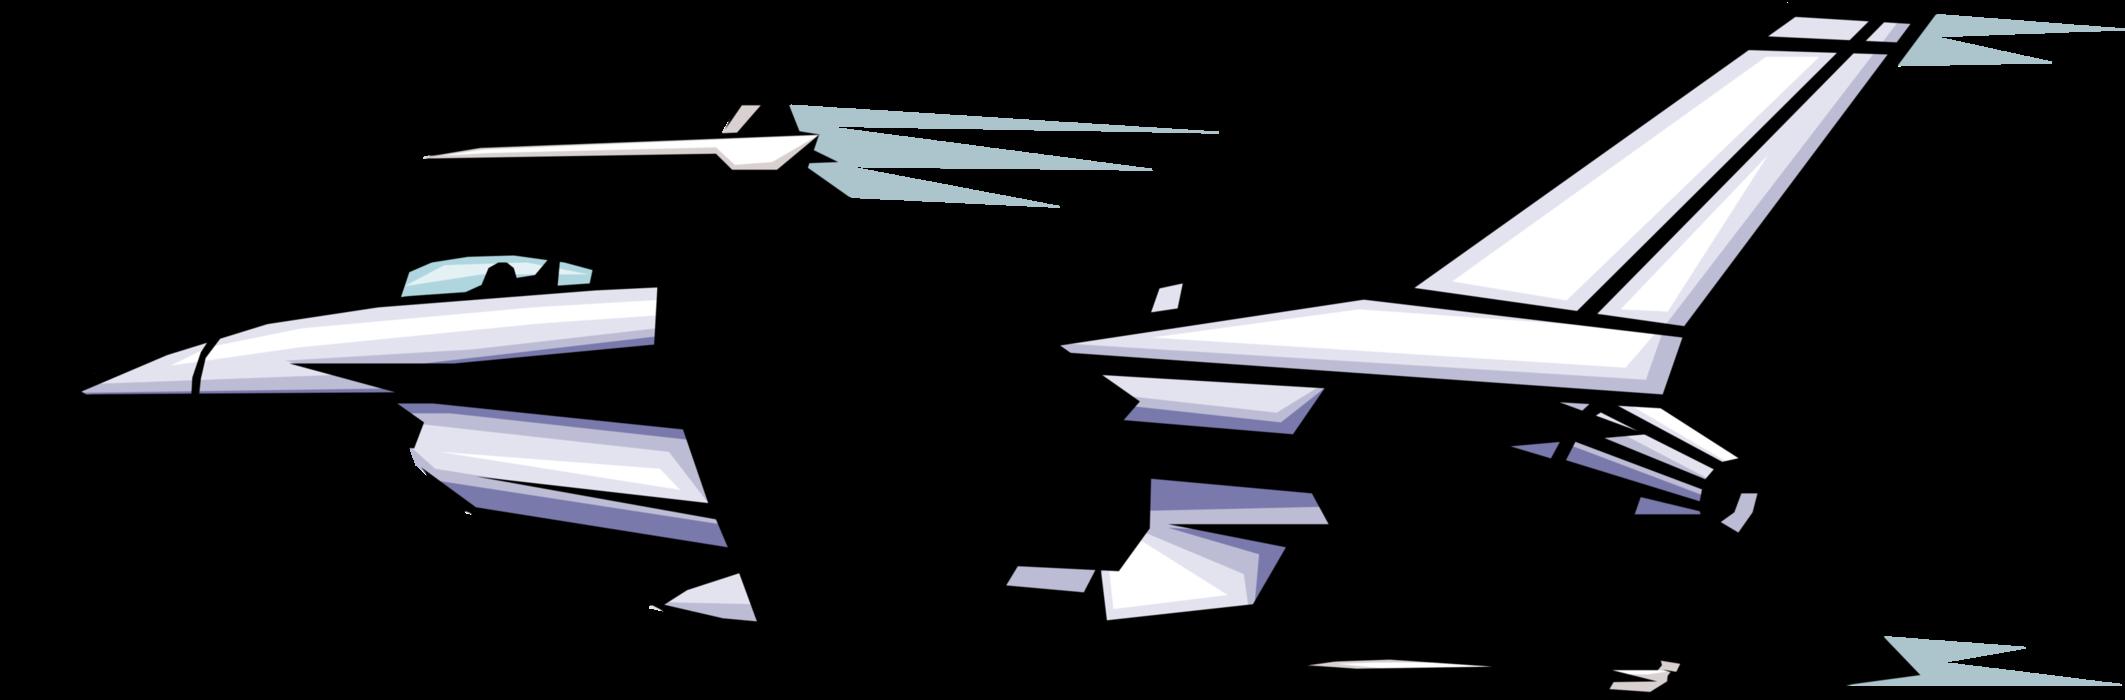 Clipart plane corsair. F falcon aircraft banking